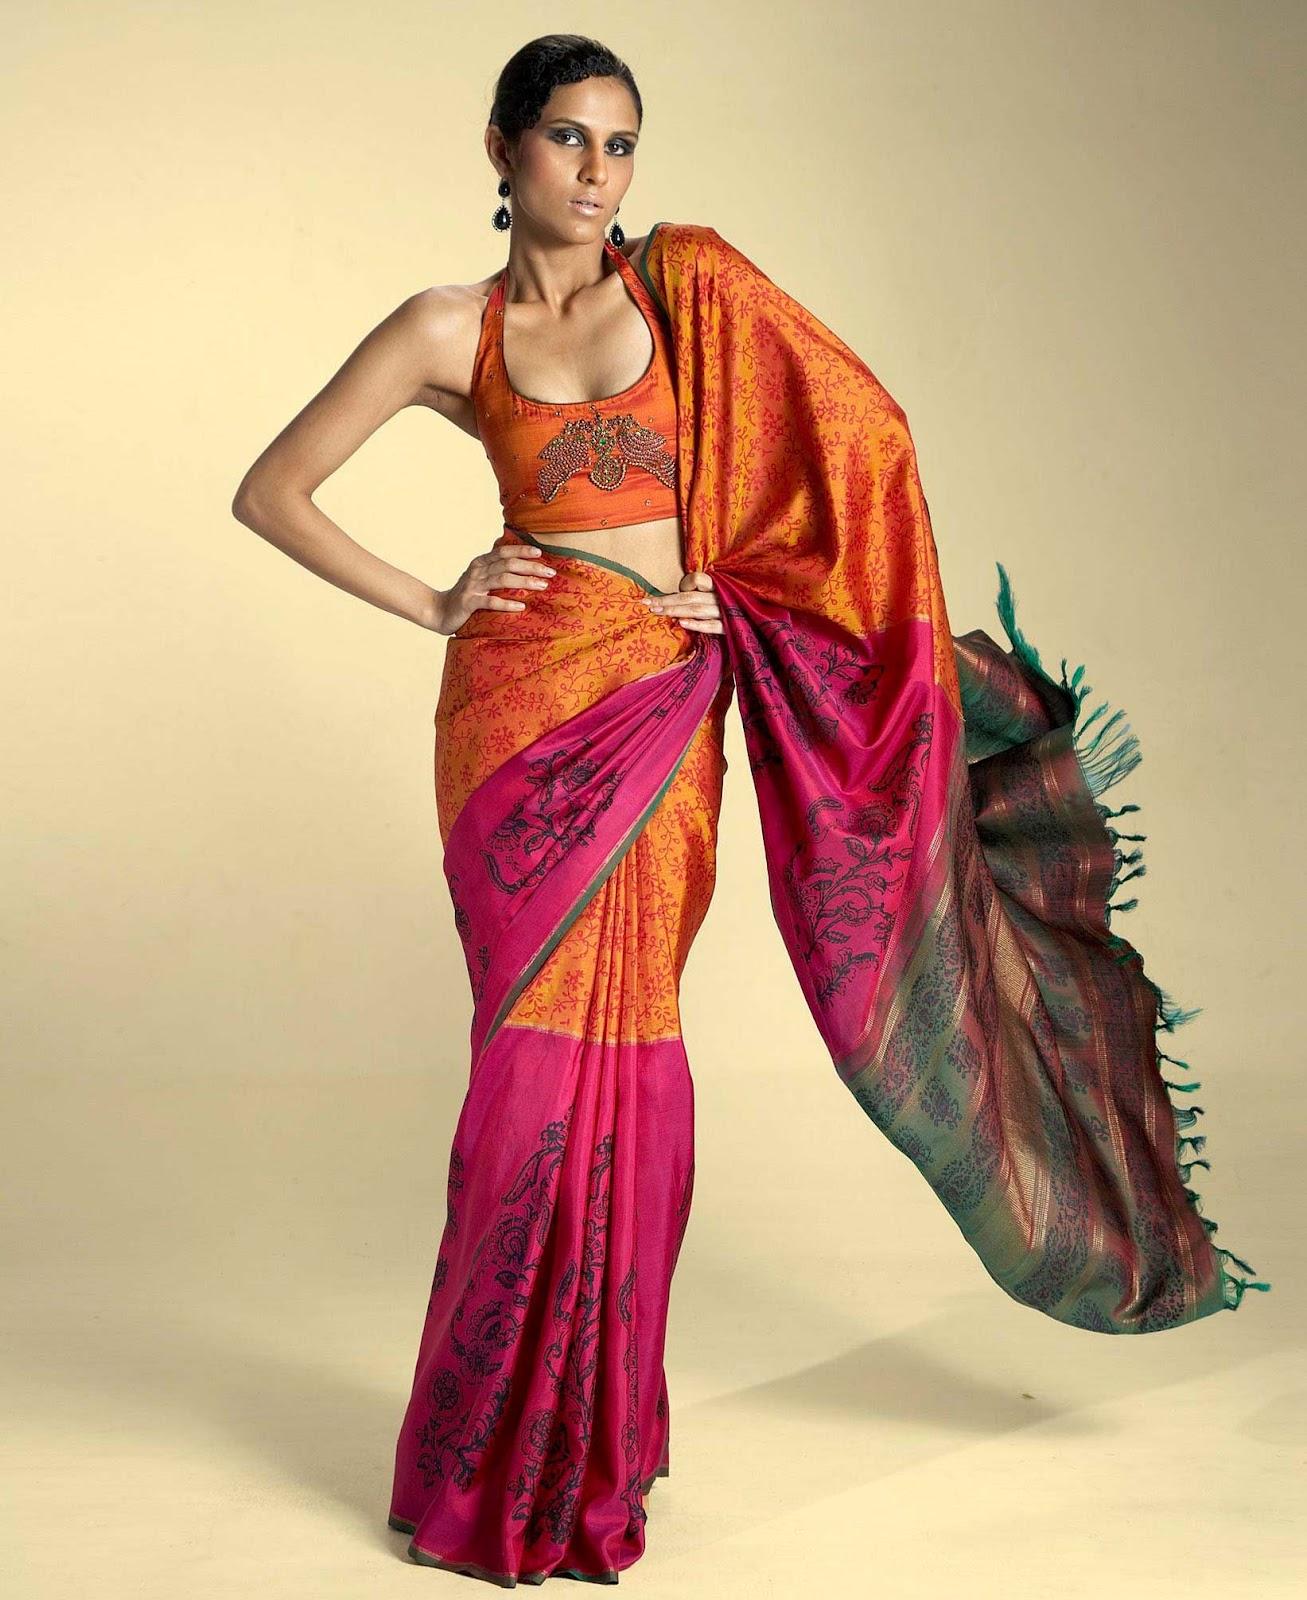 Indian Jewellery And Clothing: Stunning Rich Kanchivaram